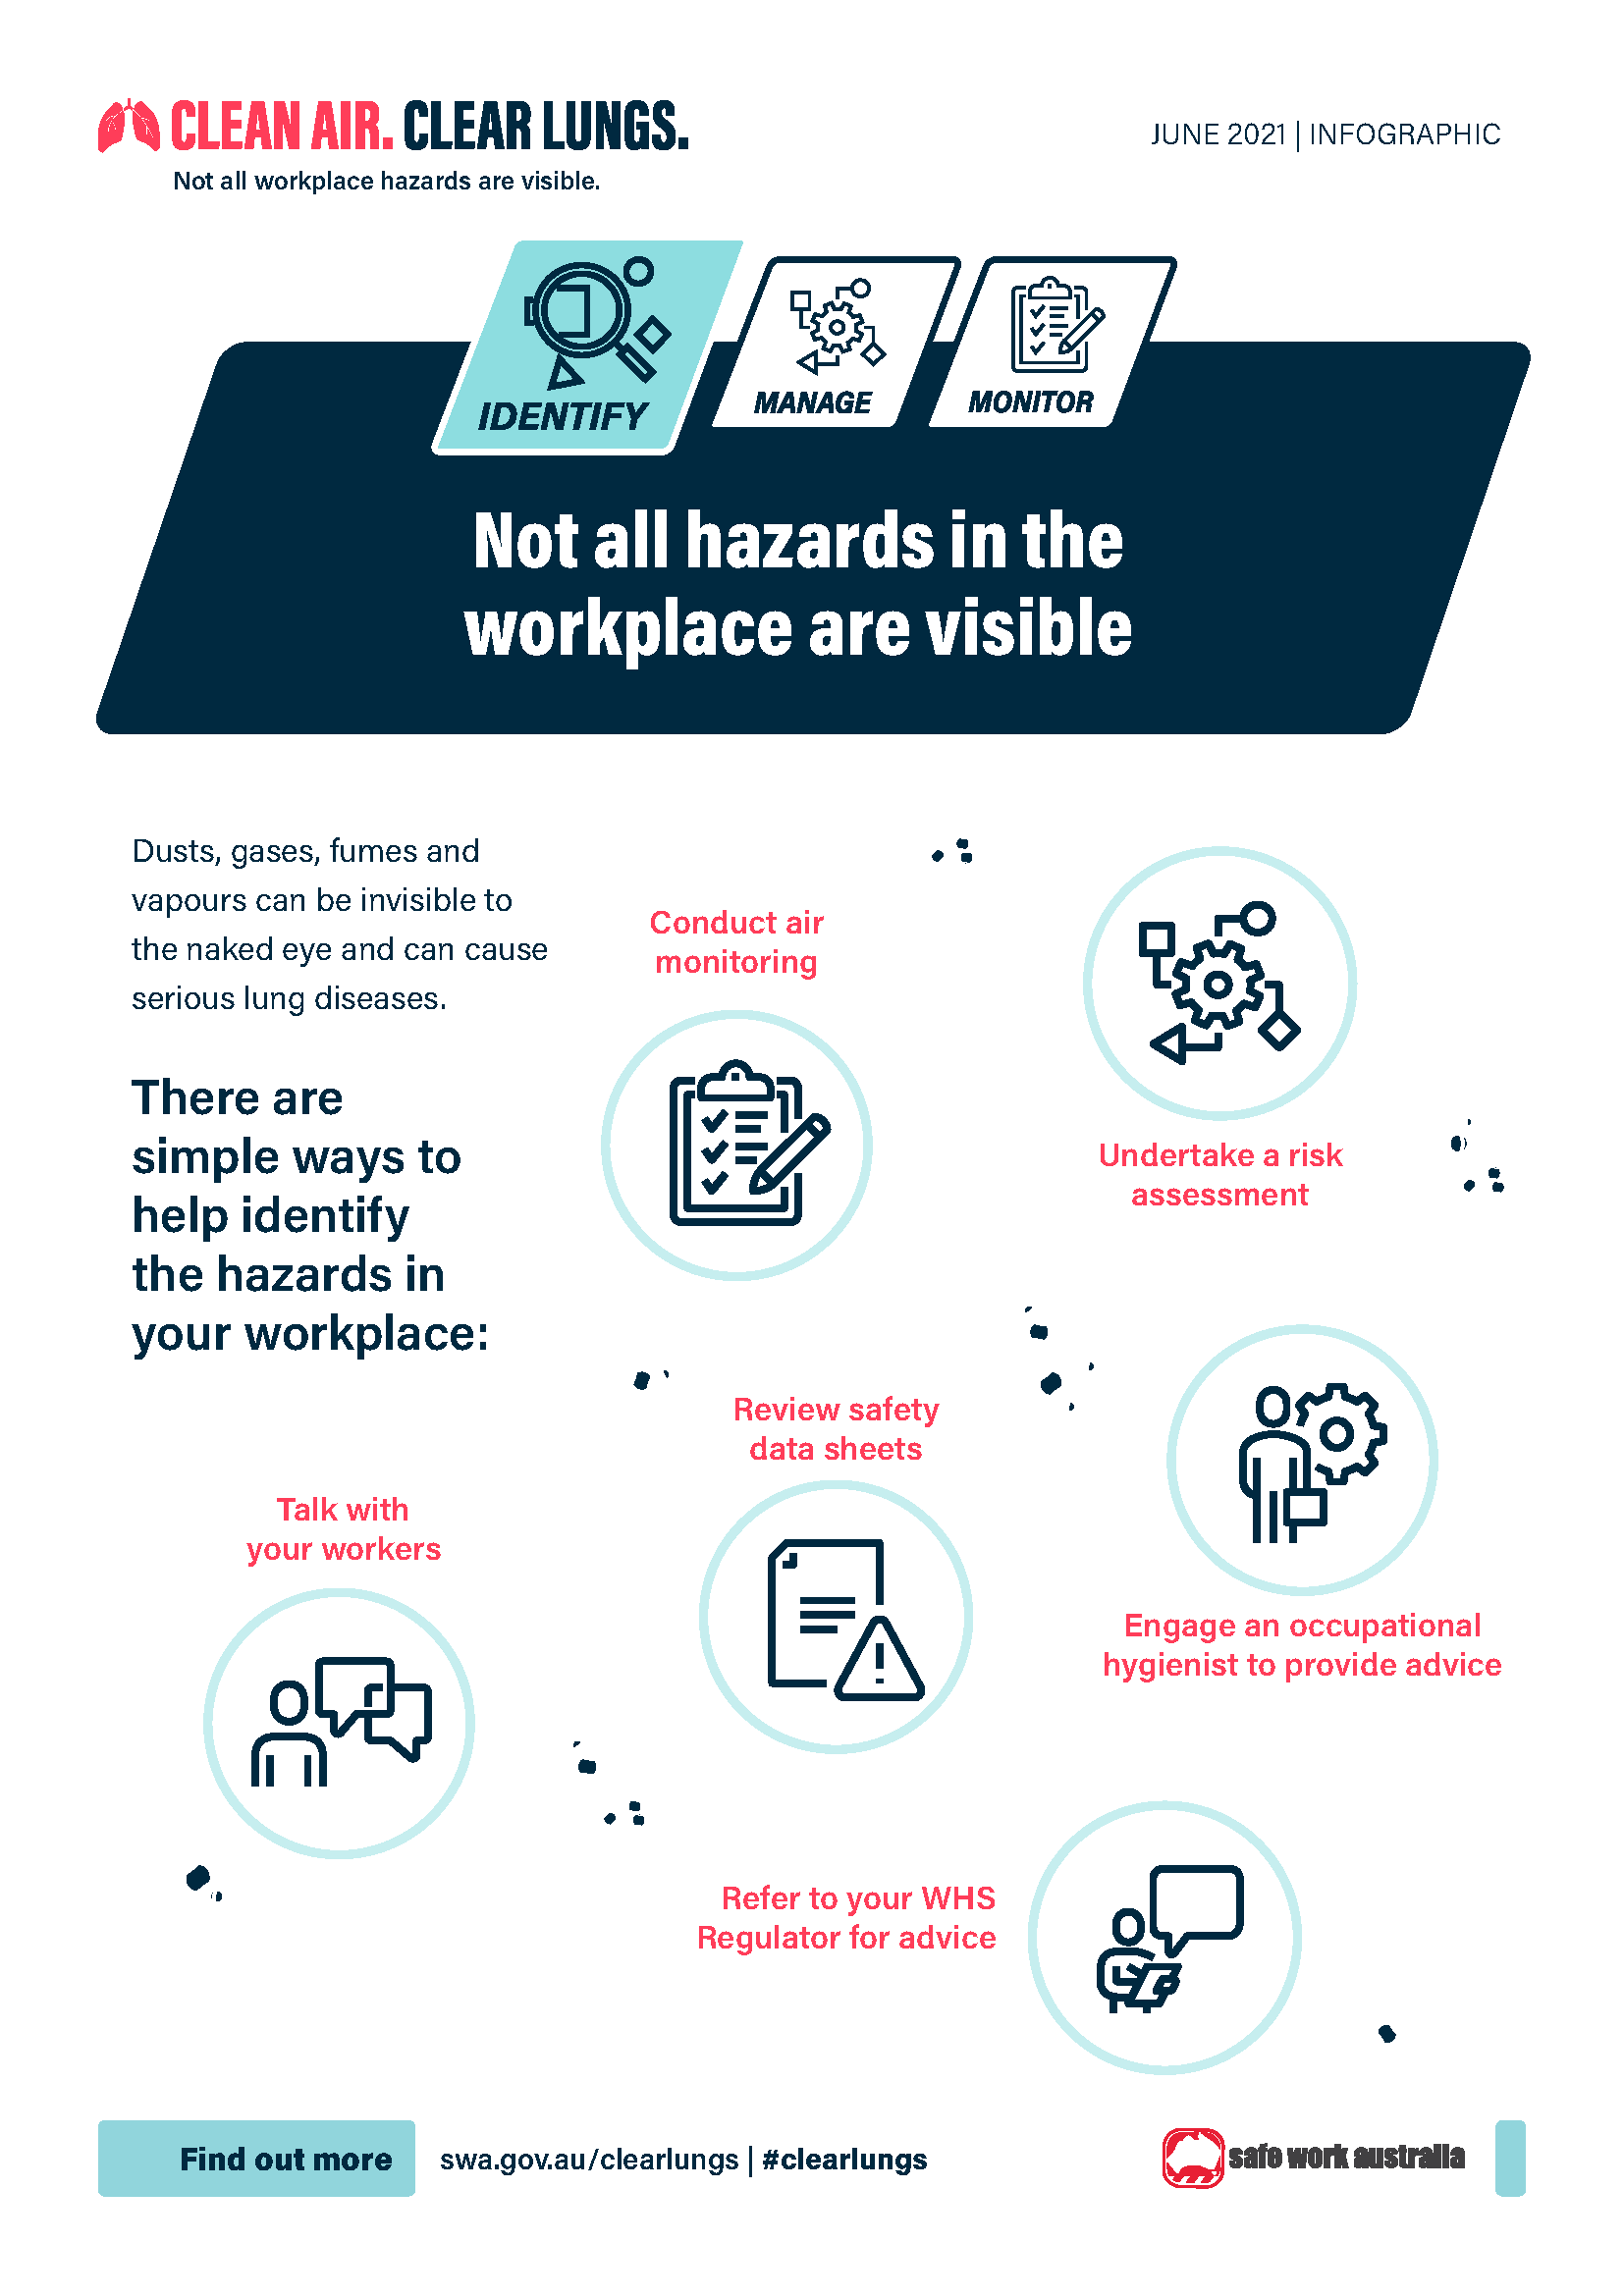 CACL_infographic_Identify-hazards